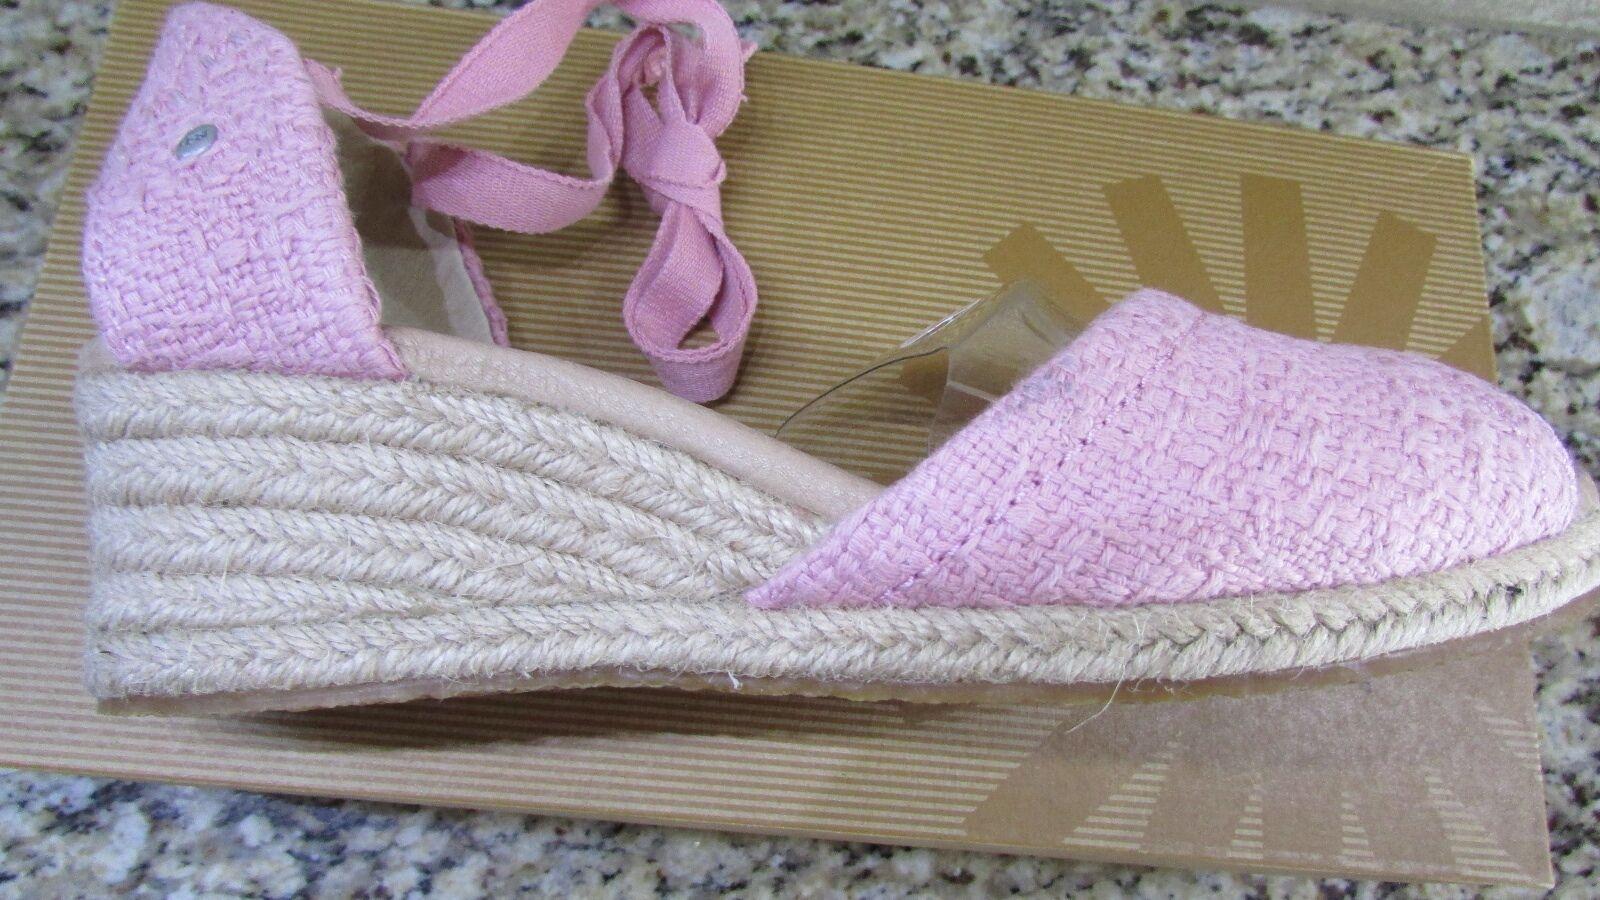 NEW UGG AUSTRALIA ROSE DELMAR SANDALES FEMMES 8.5 BLUSH WEDGE HEEL